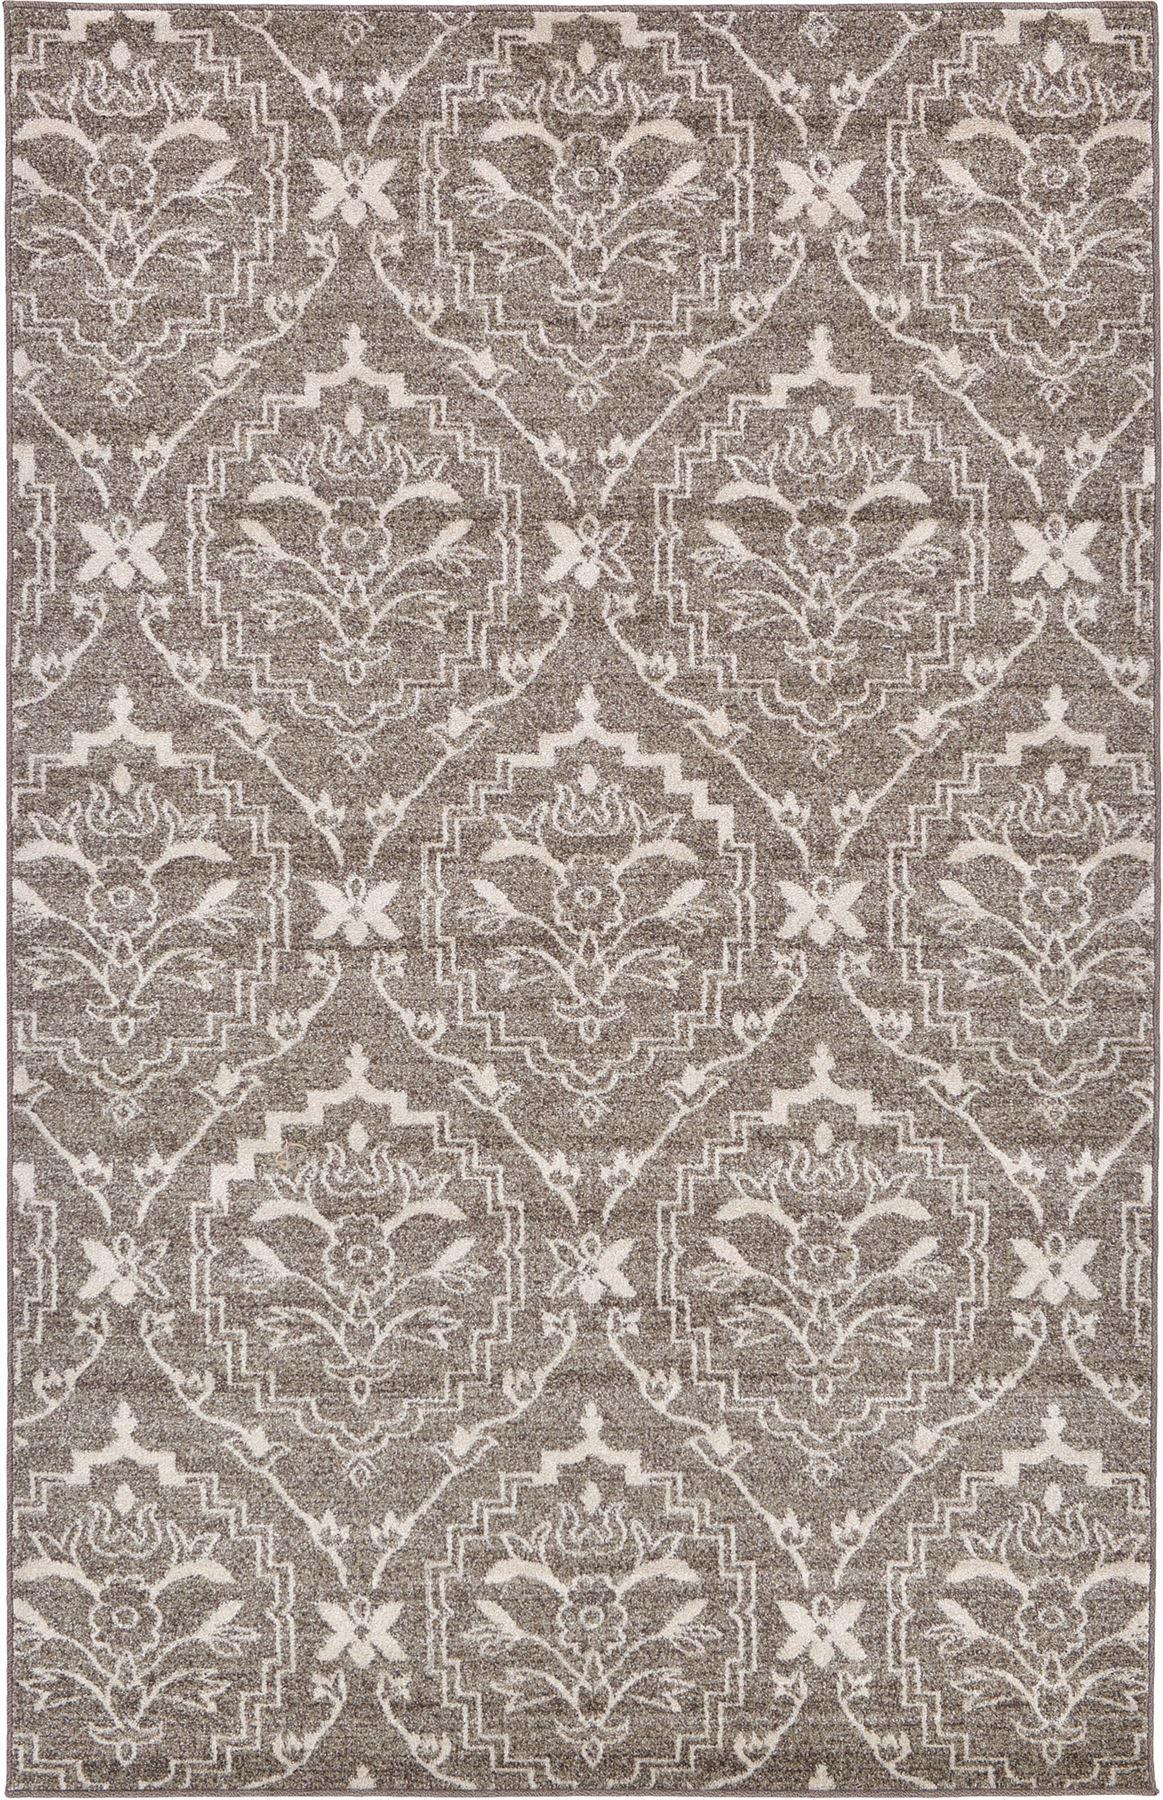 modern damask design rugs area rug floor rug contemporary carpet  - moderndamaskdesignrugsarearugfloorrug